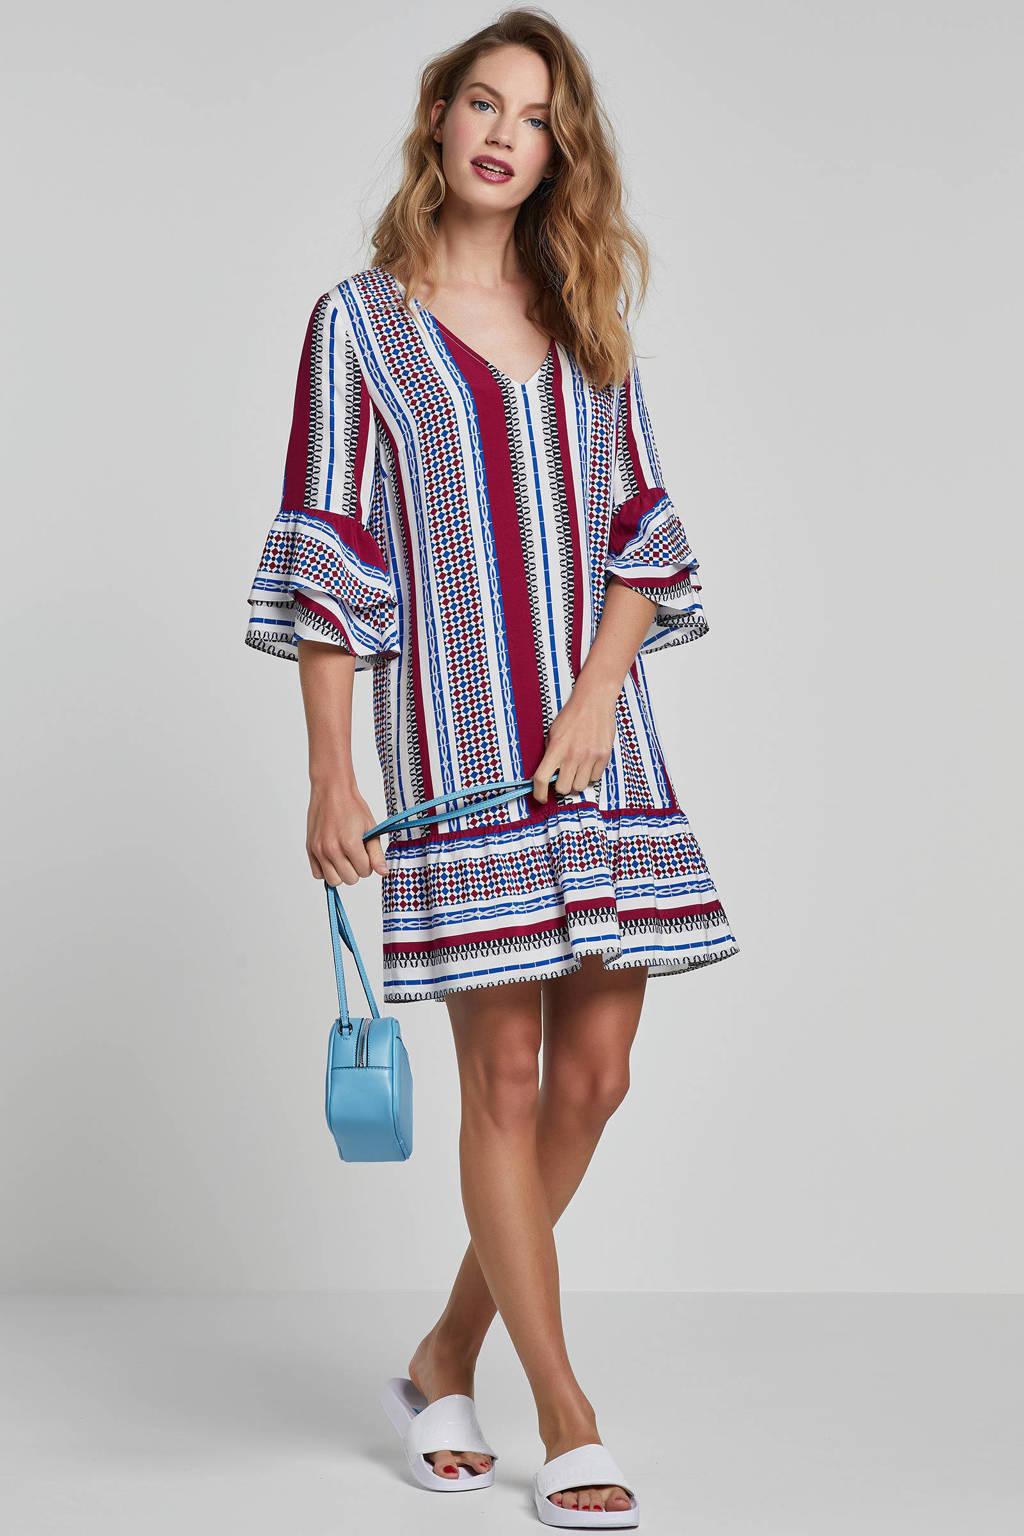 MARIA TAILOR jurk met all over print, Blauw/rood/wit